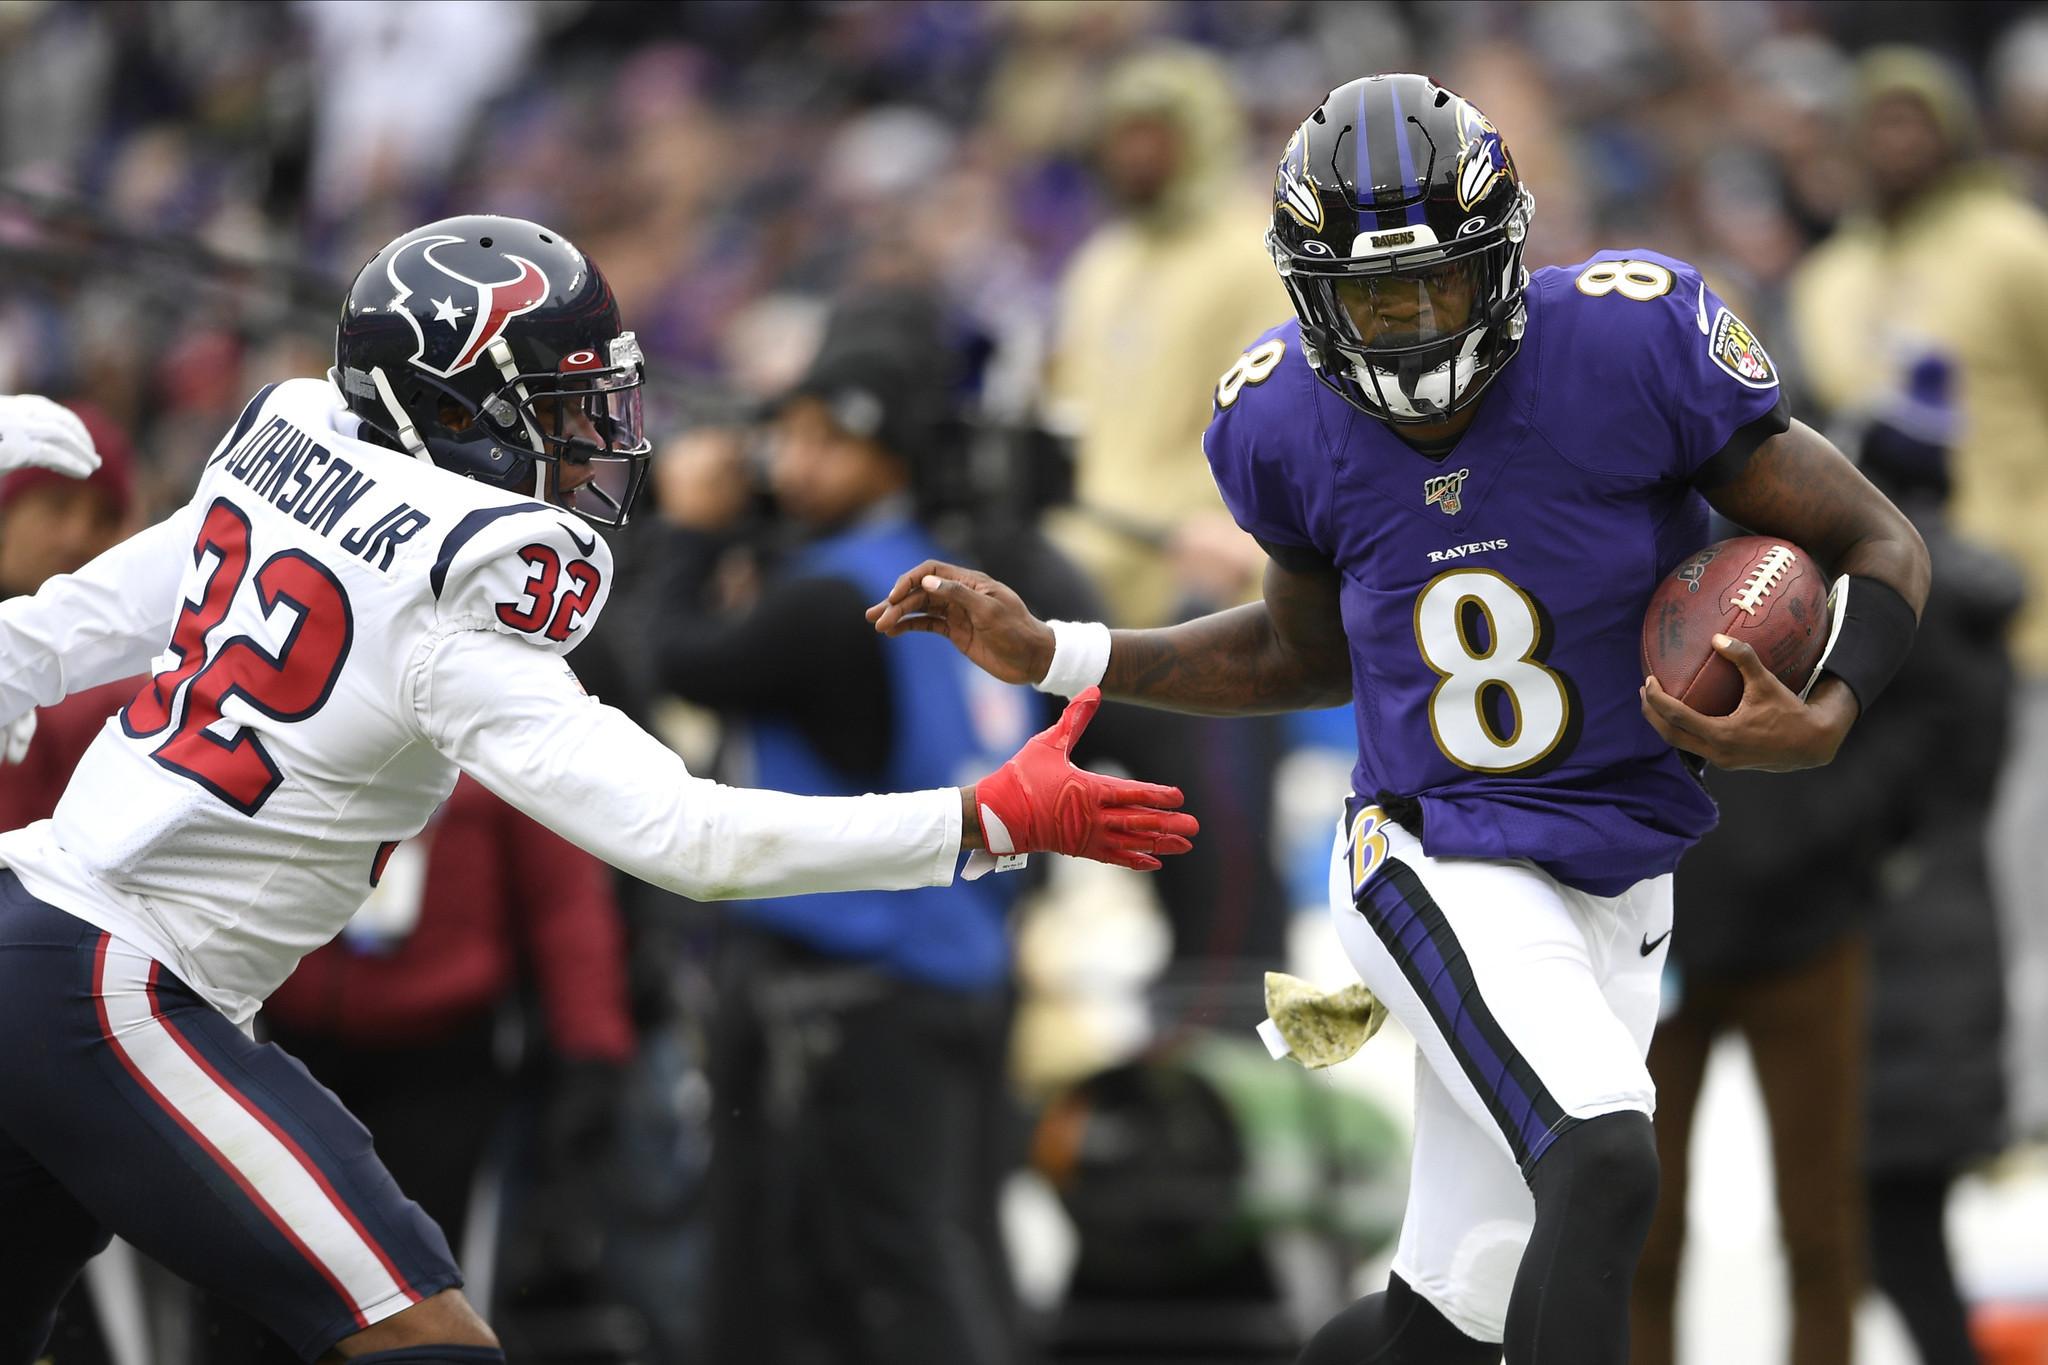 Lamar Jackson, Jamal Adams and Dak Prescott light up the NFL in a high-scoring Week 11